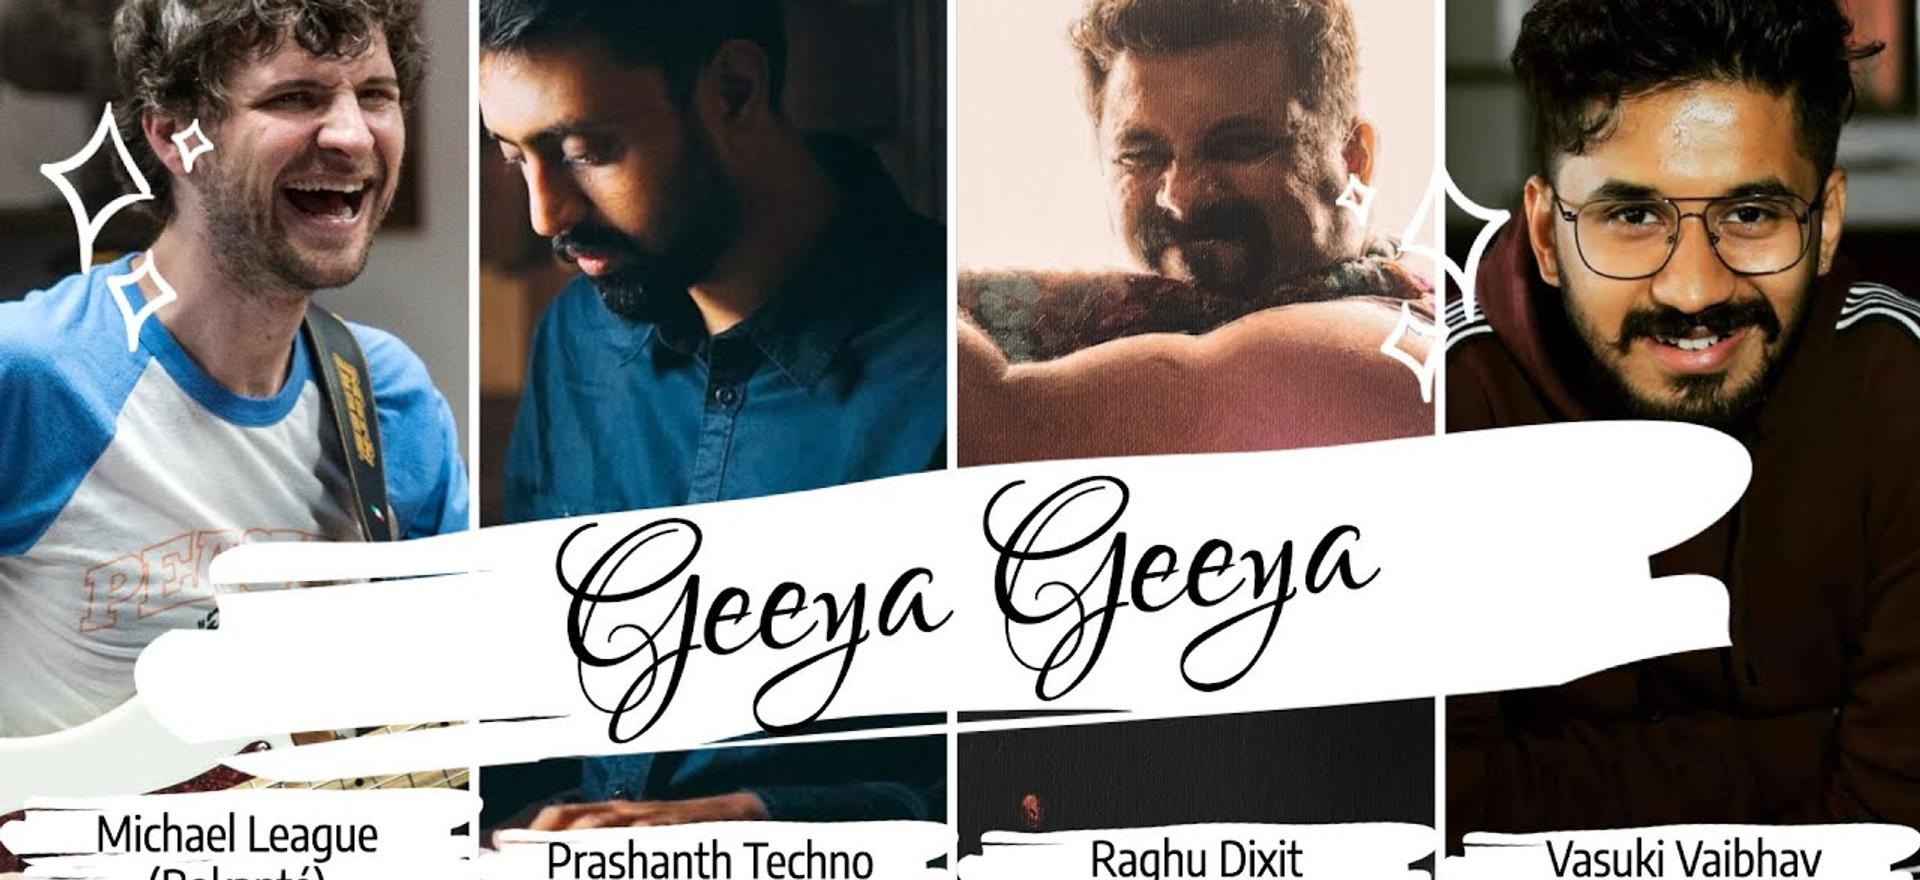 Geeya Geeya - Michael League (Bokante)|Prashanth Techno|Raghu Dixit|Vasuki Vaibhav